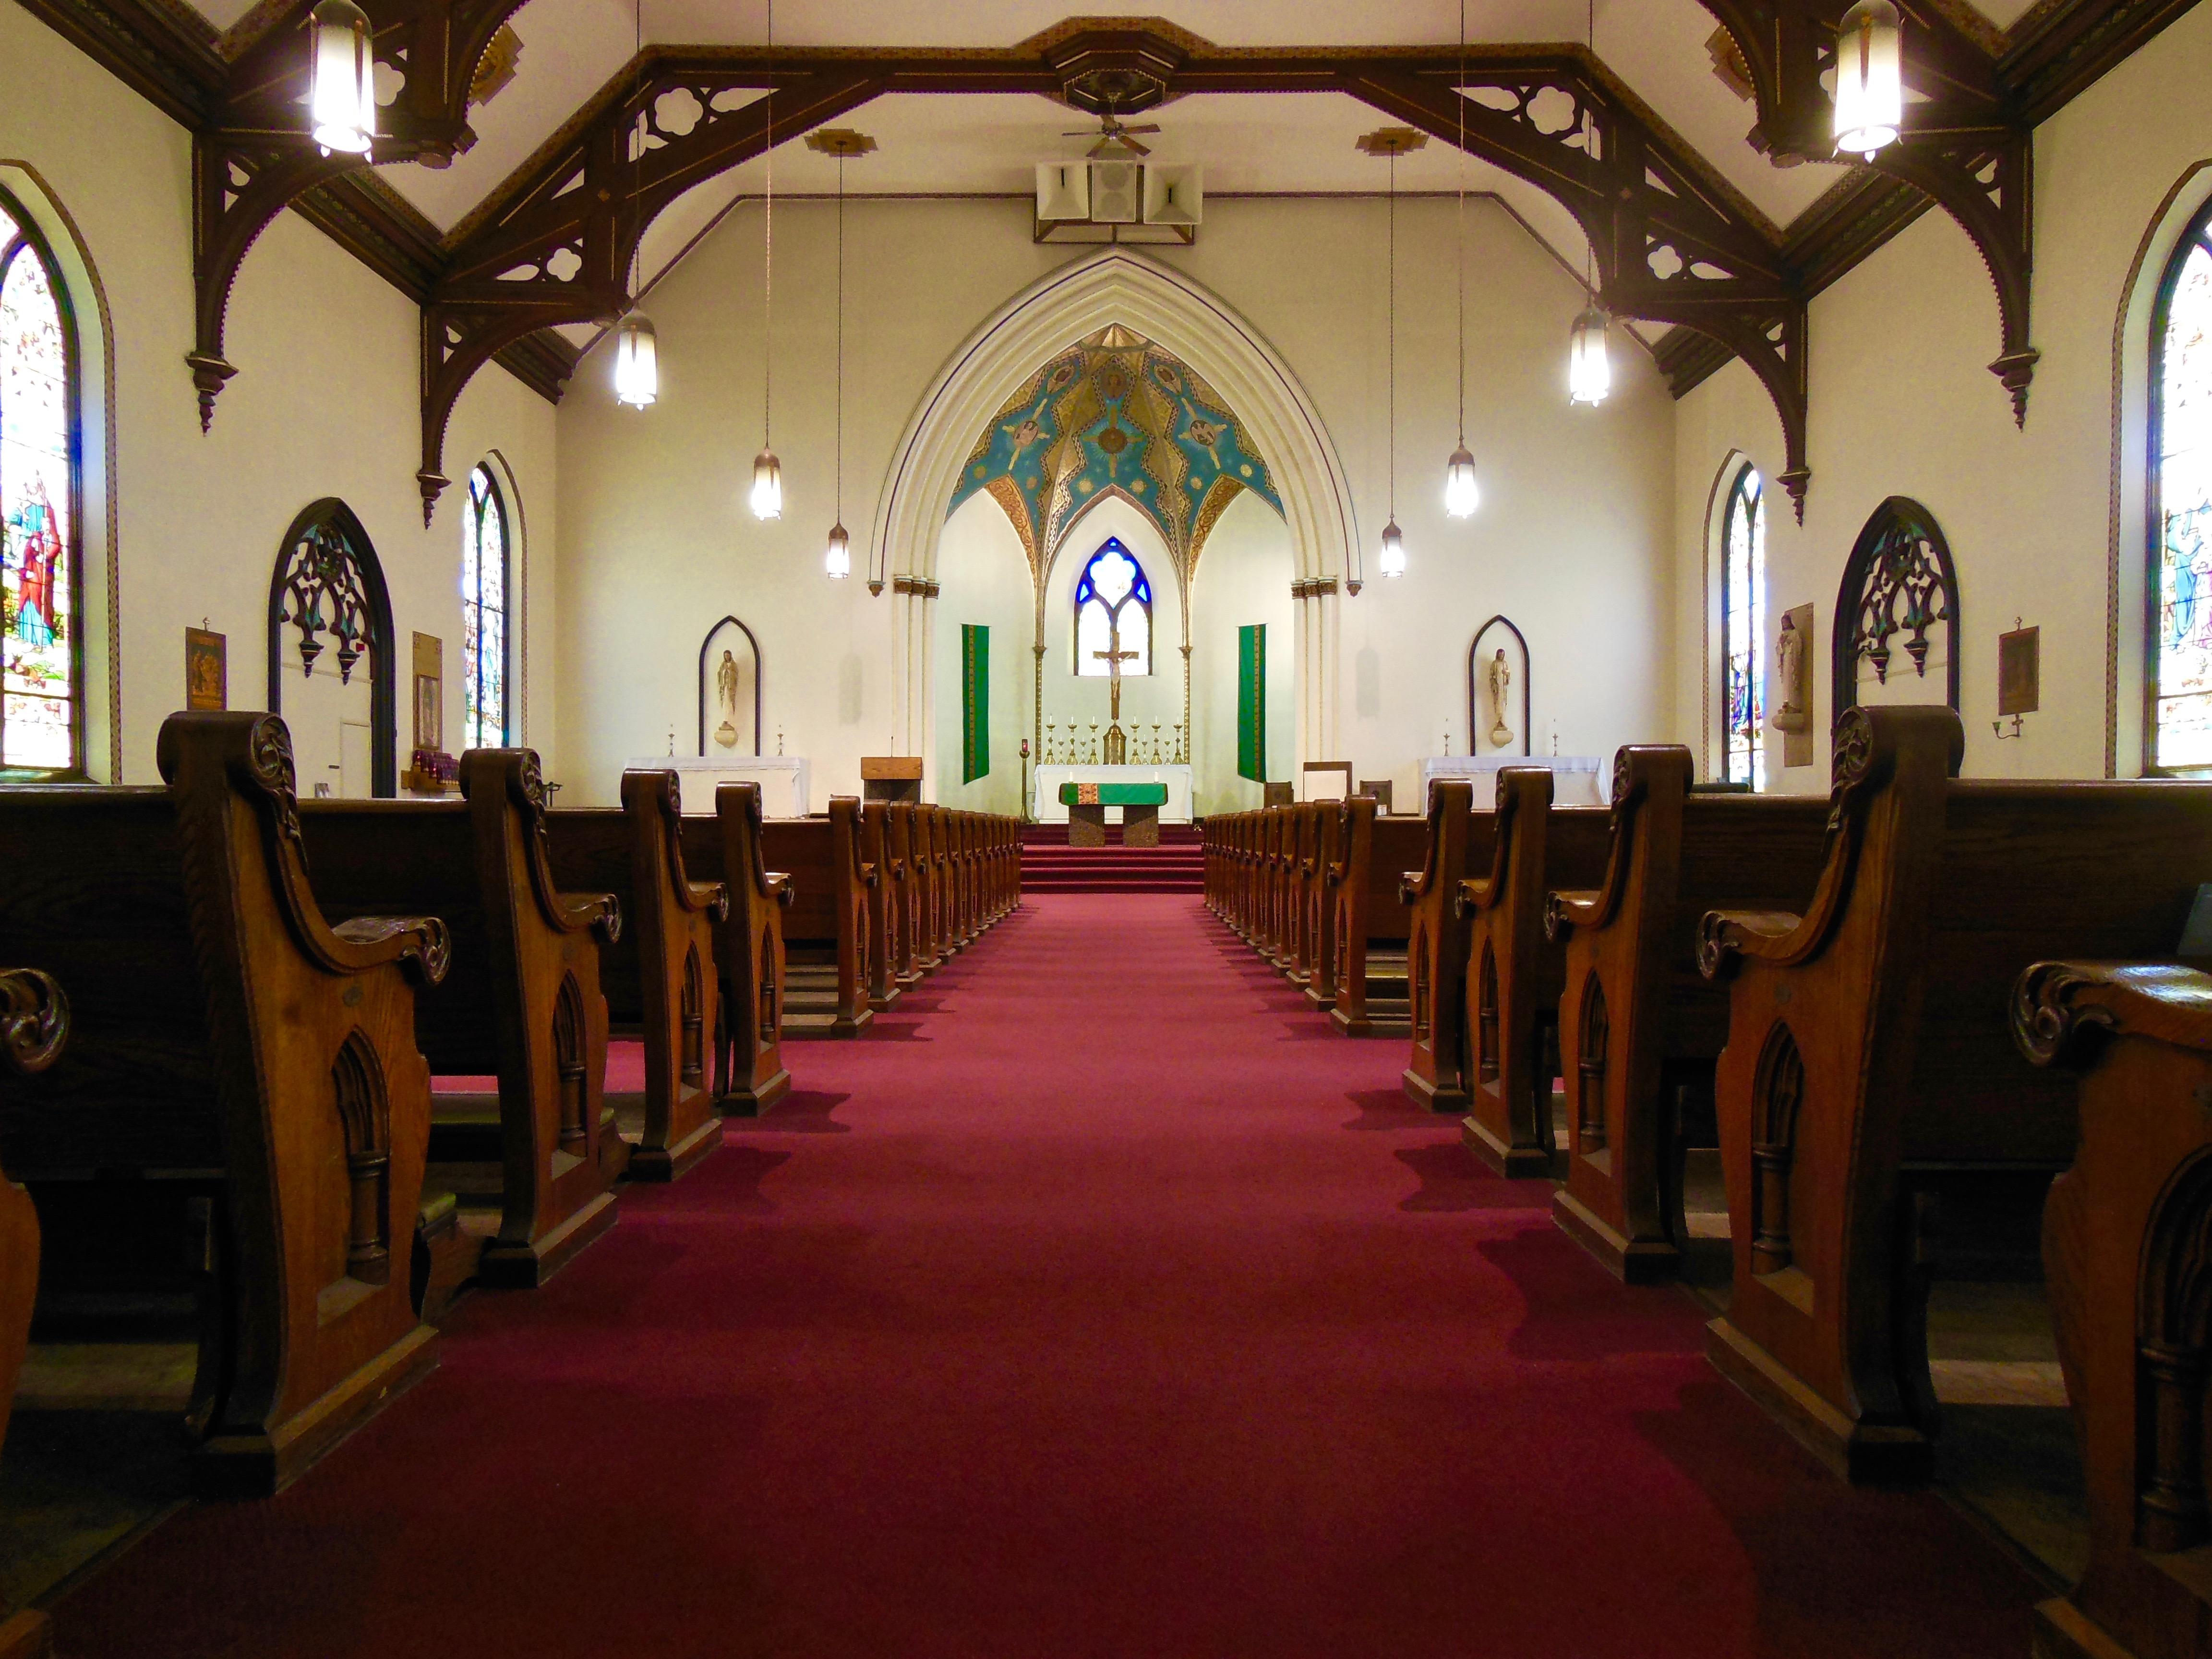 Interior from Main Doors